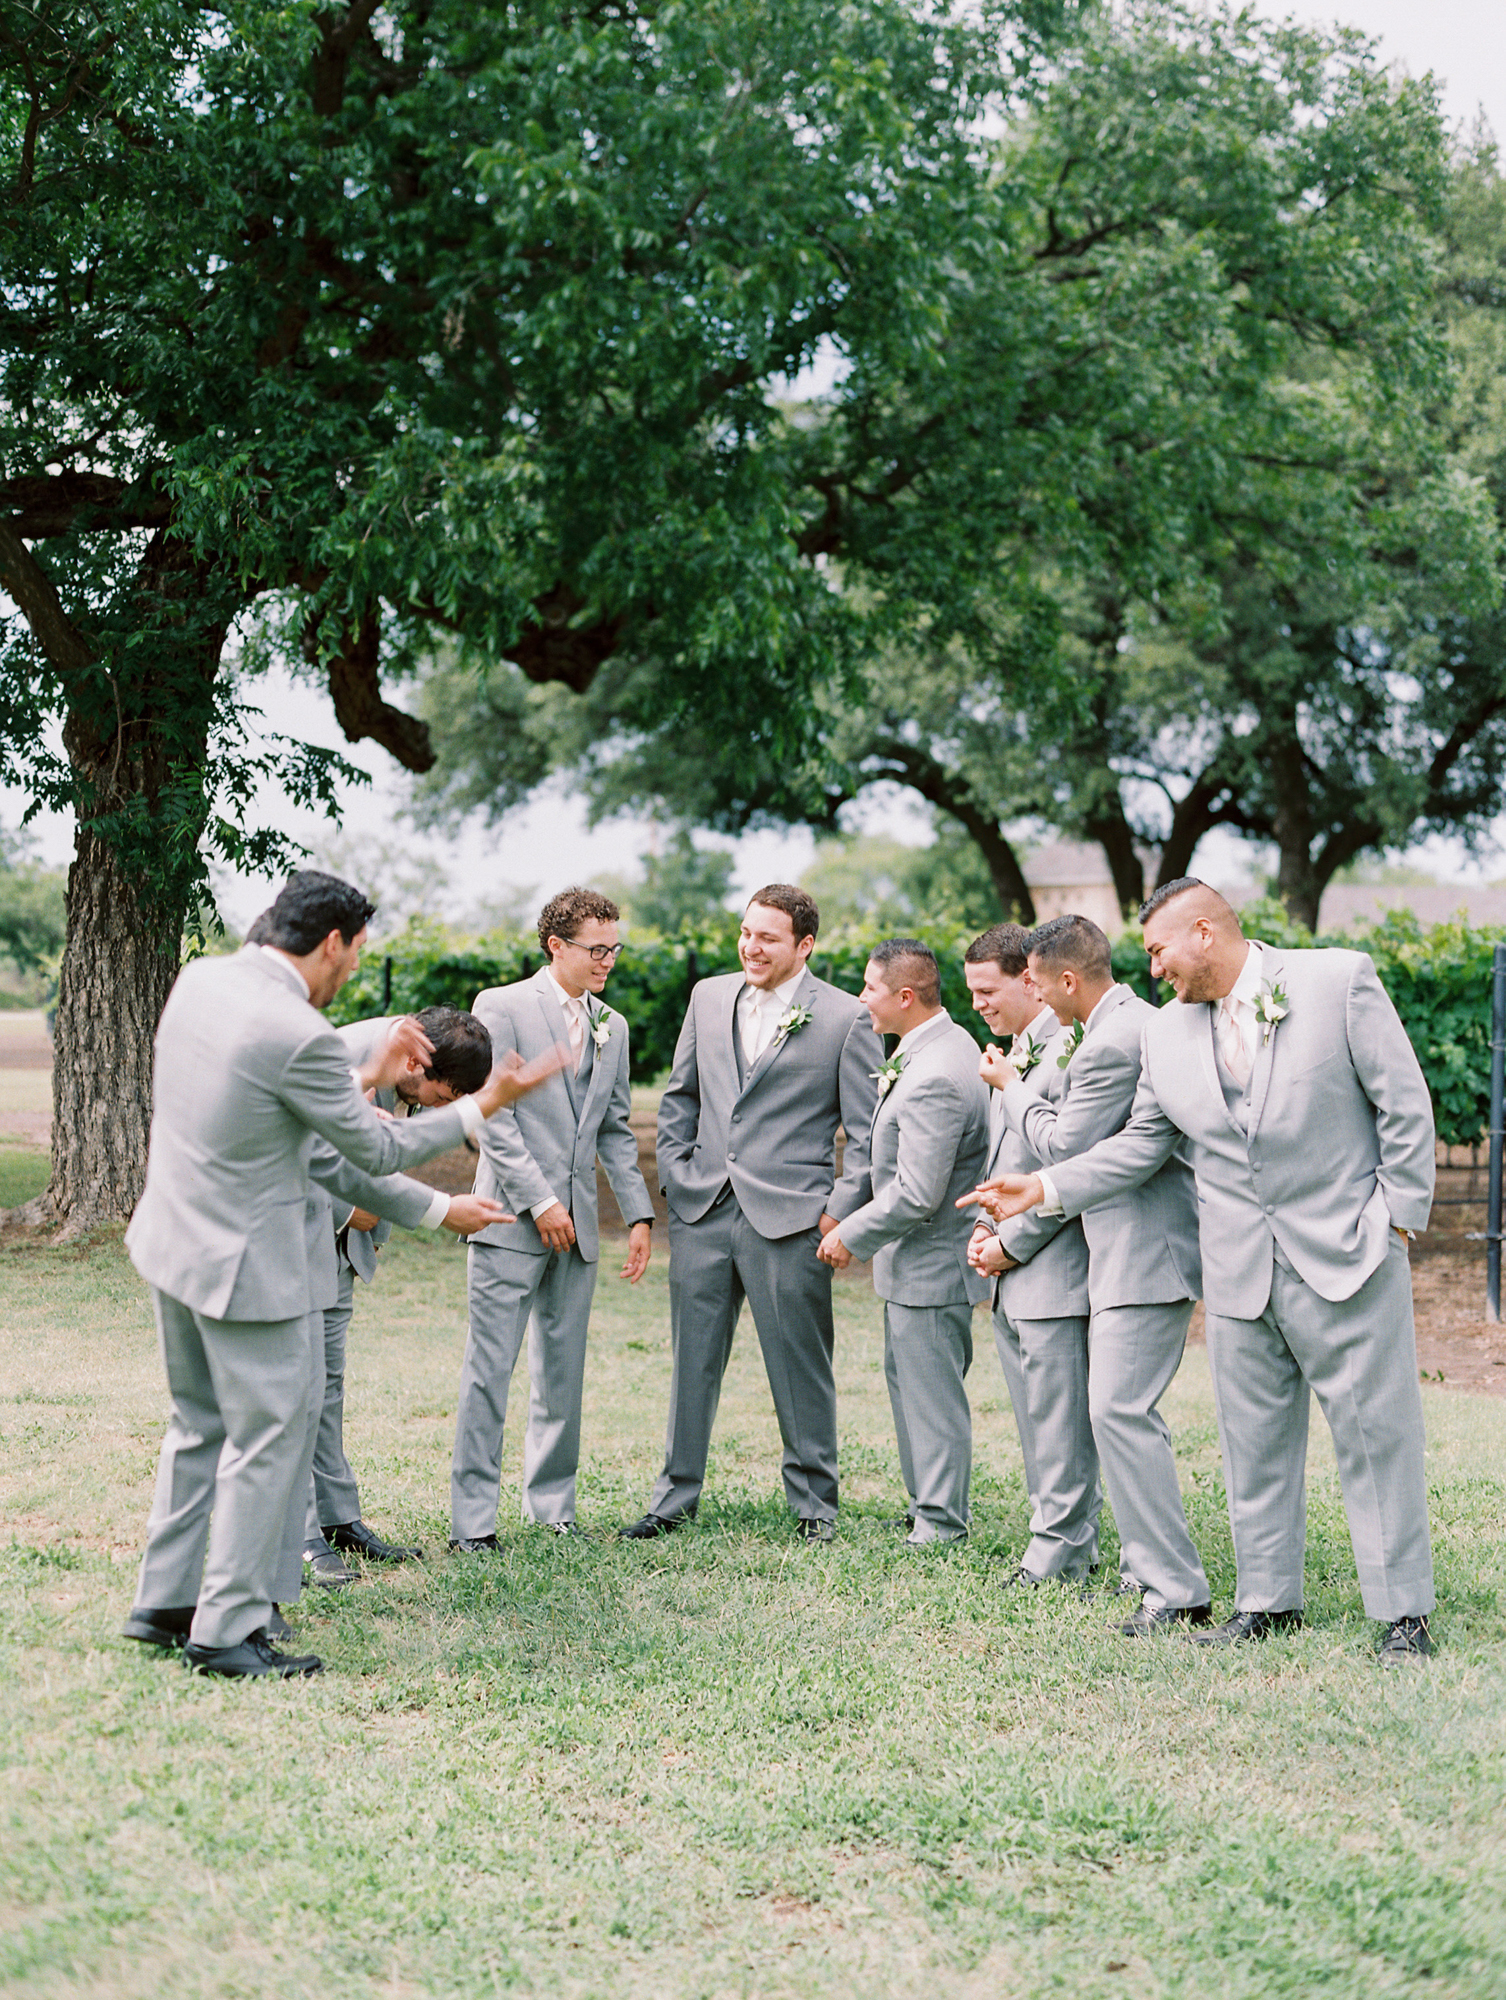 Elegant Spring Vineyard Wedding | Film Wedding Photographer | Austin Wedding Photographer | Groomsmen in Gray Suits | Britni Dean Photography // britnidean.com